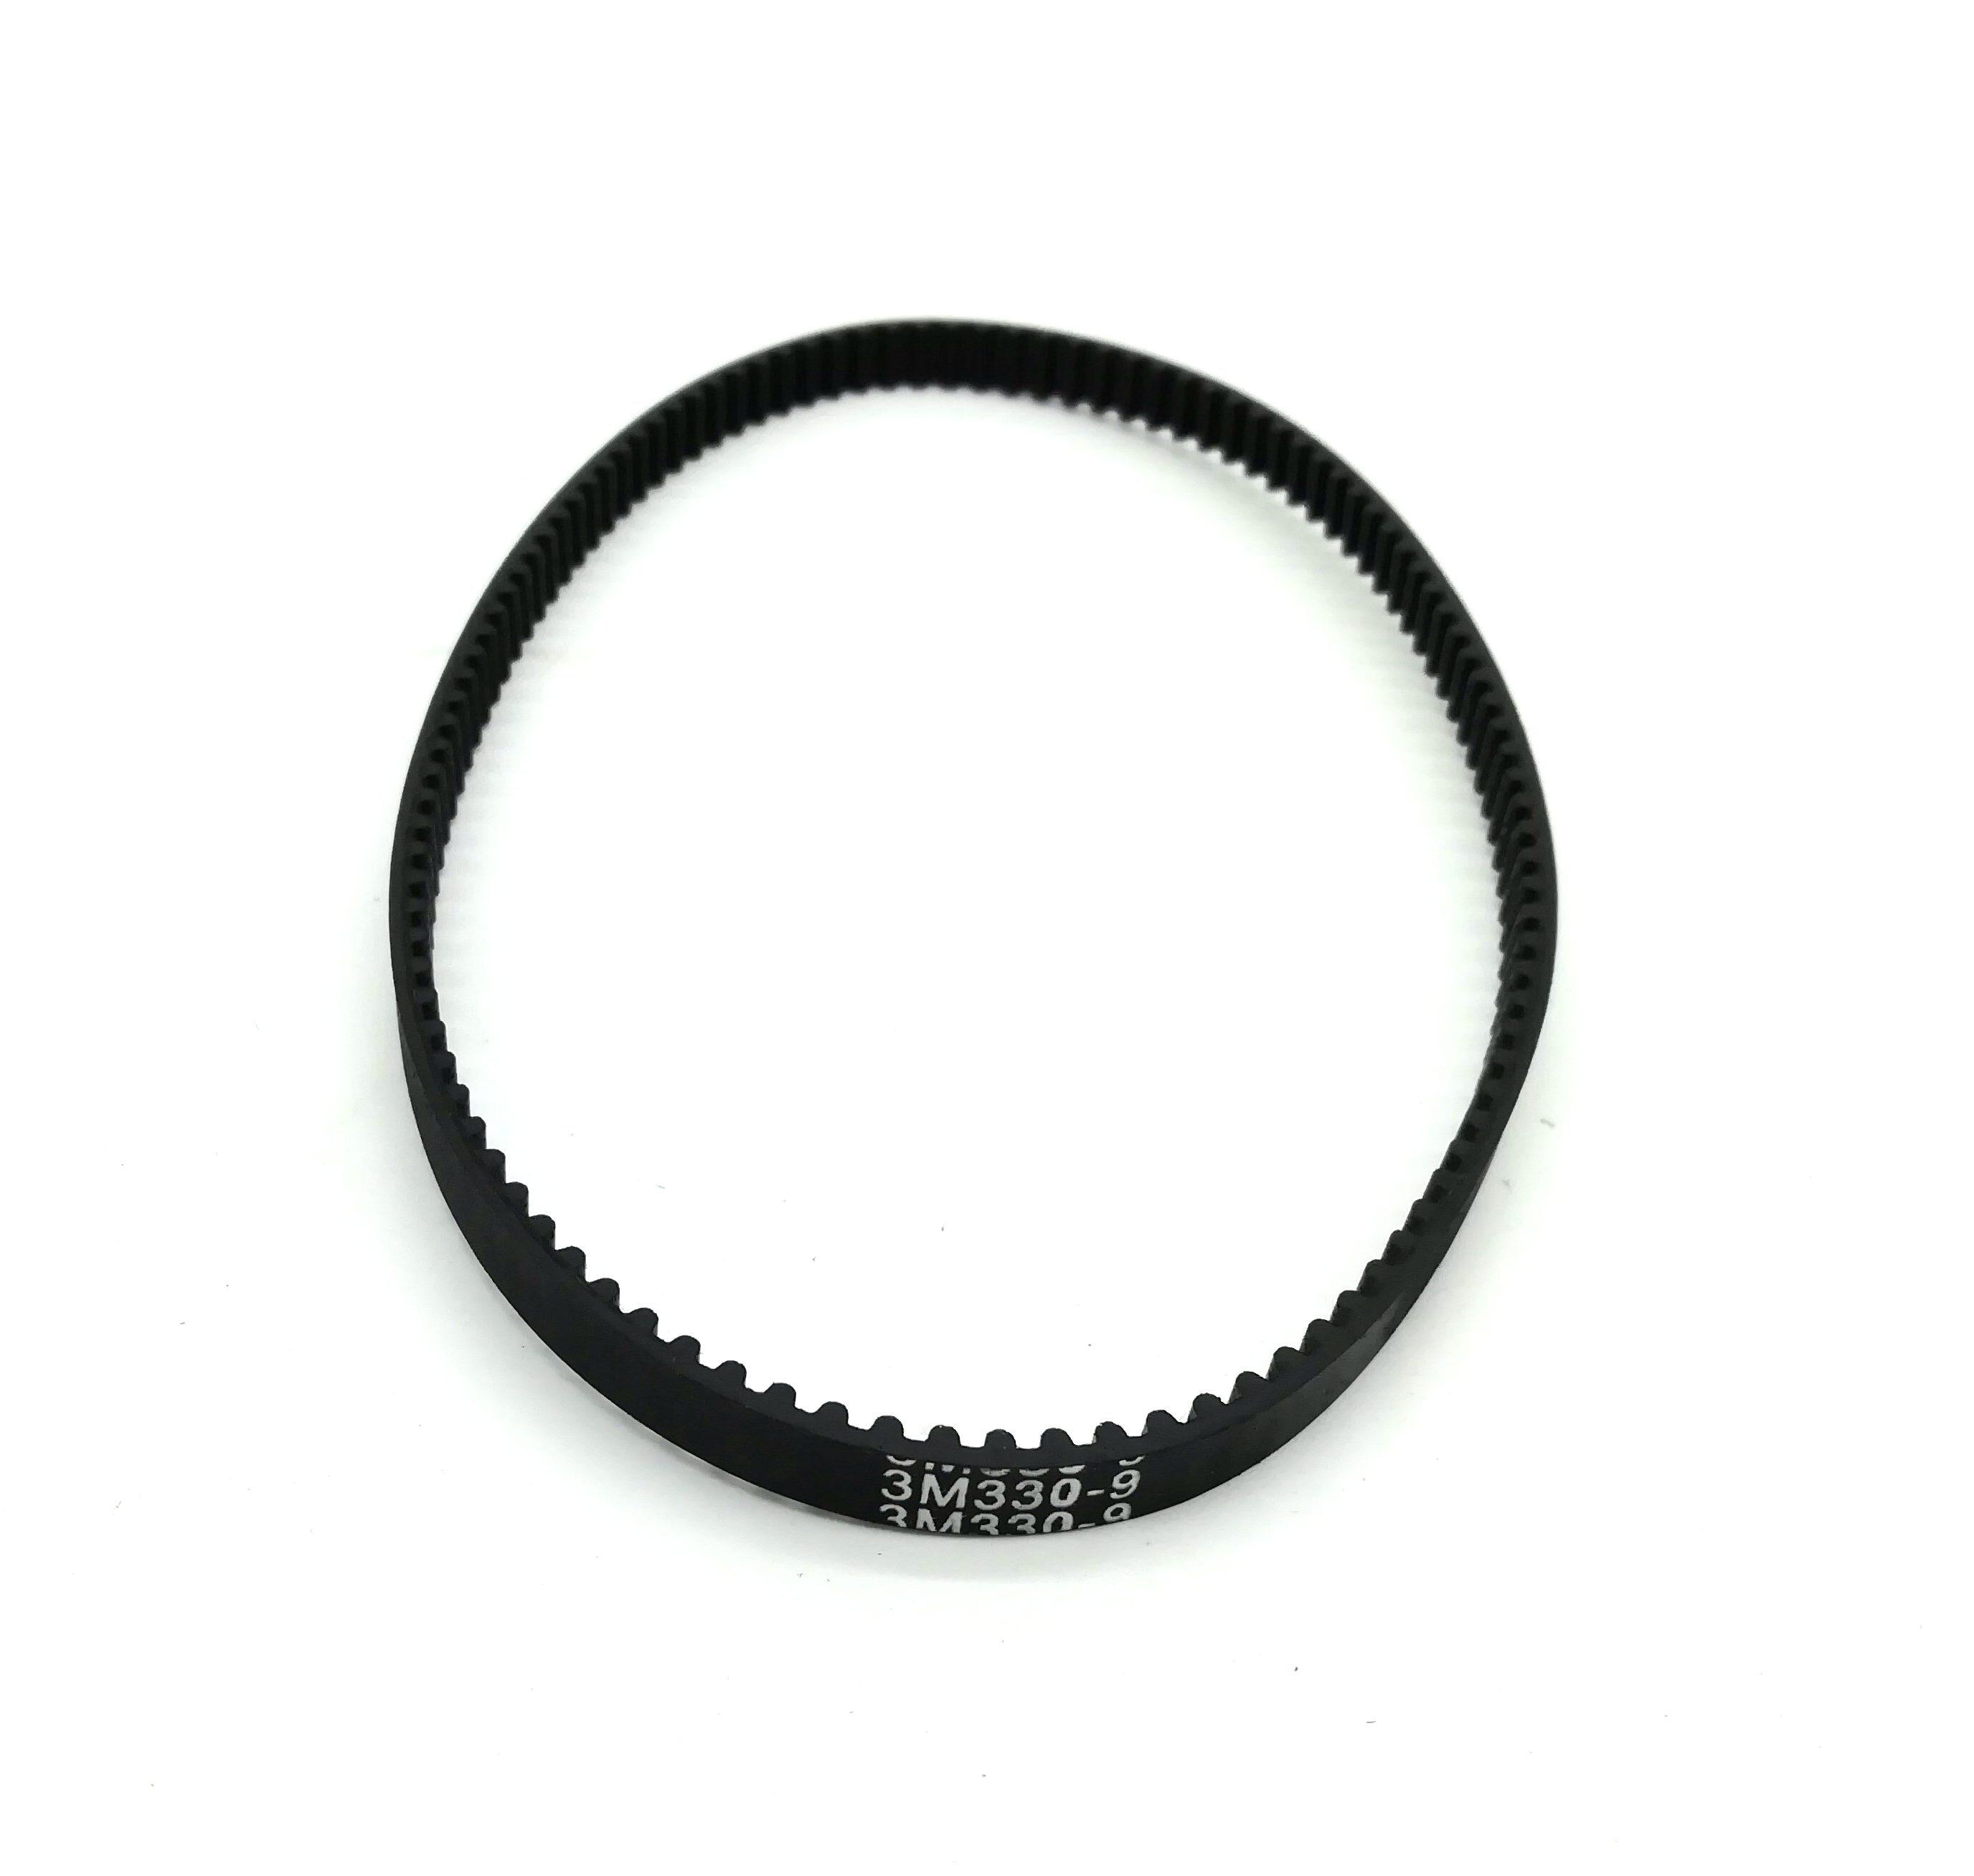 5pcs timing belt 384 12 3m 12mm width 384mm length HTD 3M, Timing Belt, Closed-loop, 330mm length, 110 teeth, 6mm width